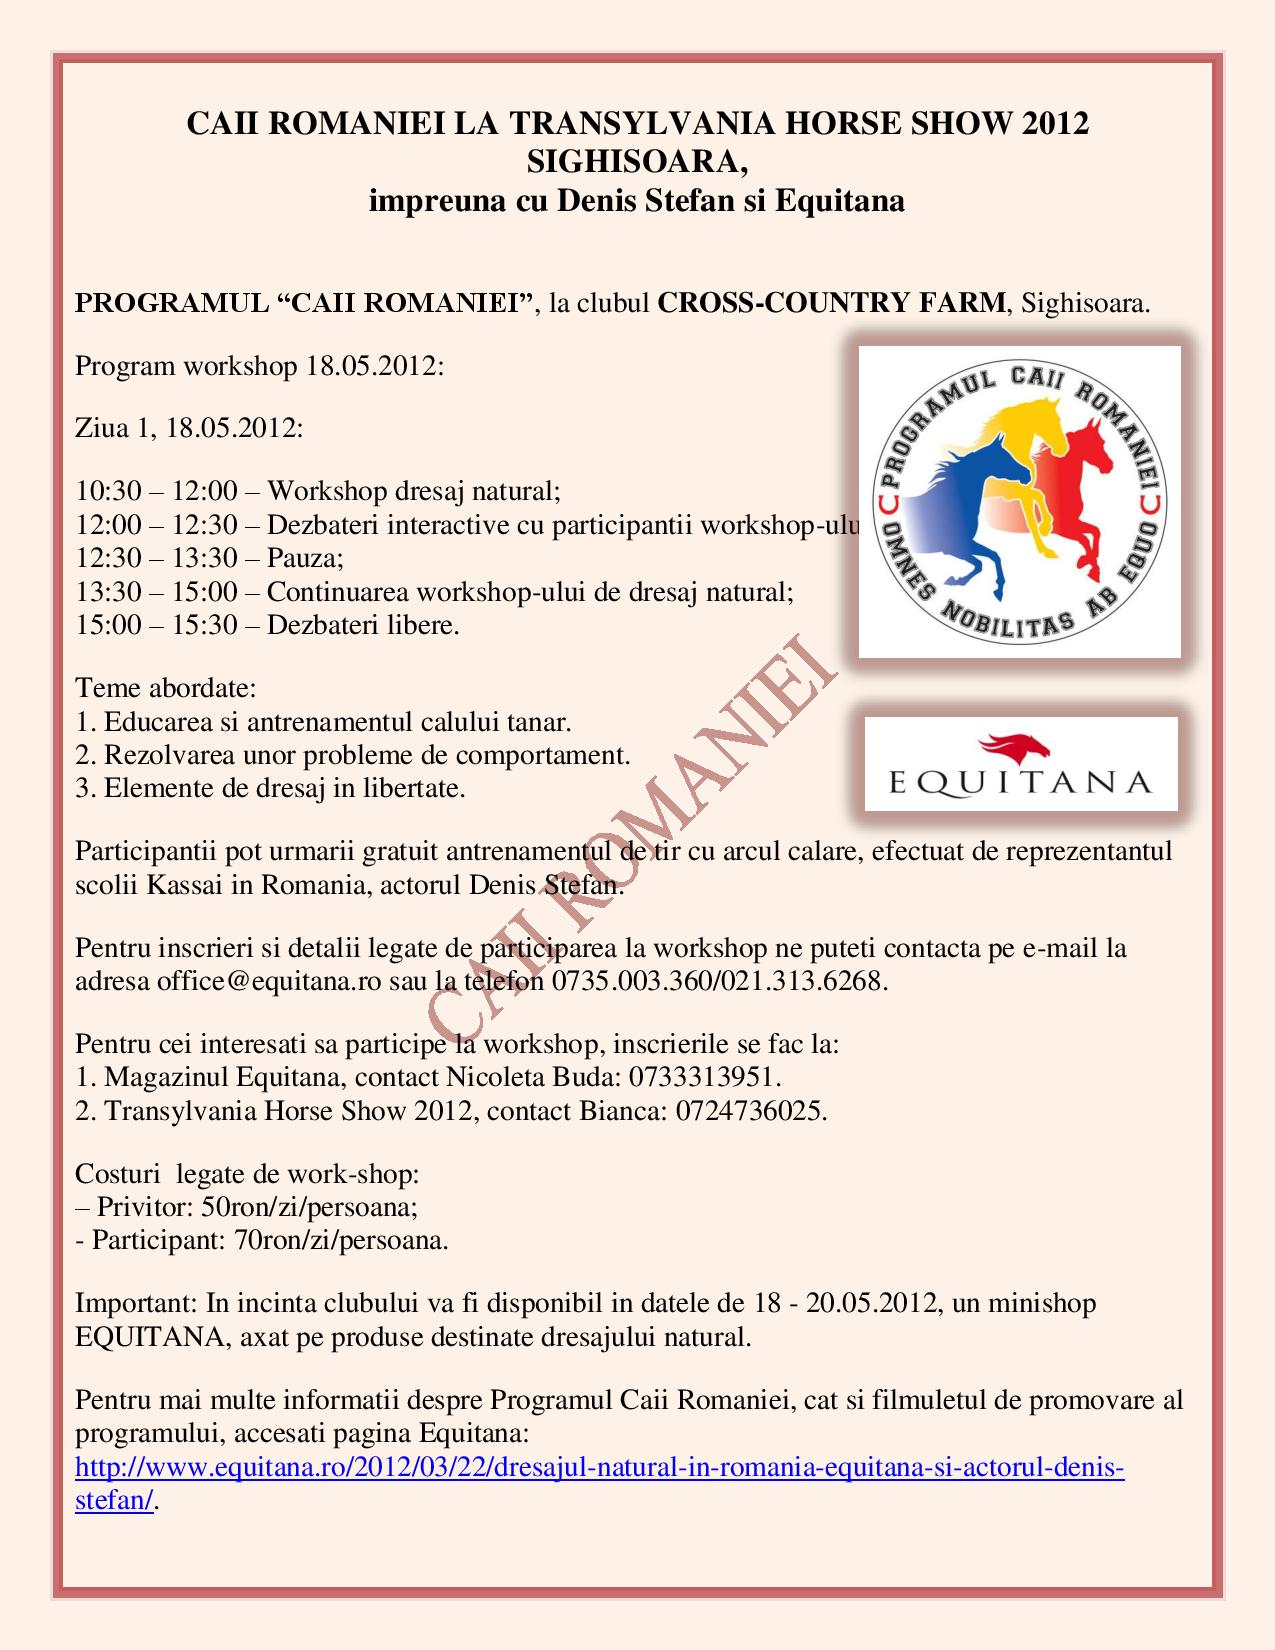 CAII ROMANIEI LA TRANSYLVANIA HORSE SHOW 2012 SIGHISOARA